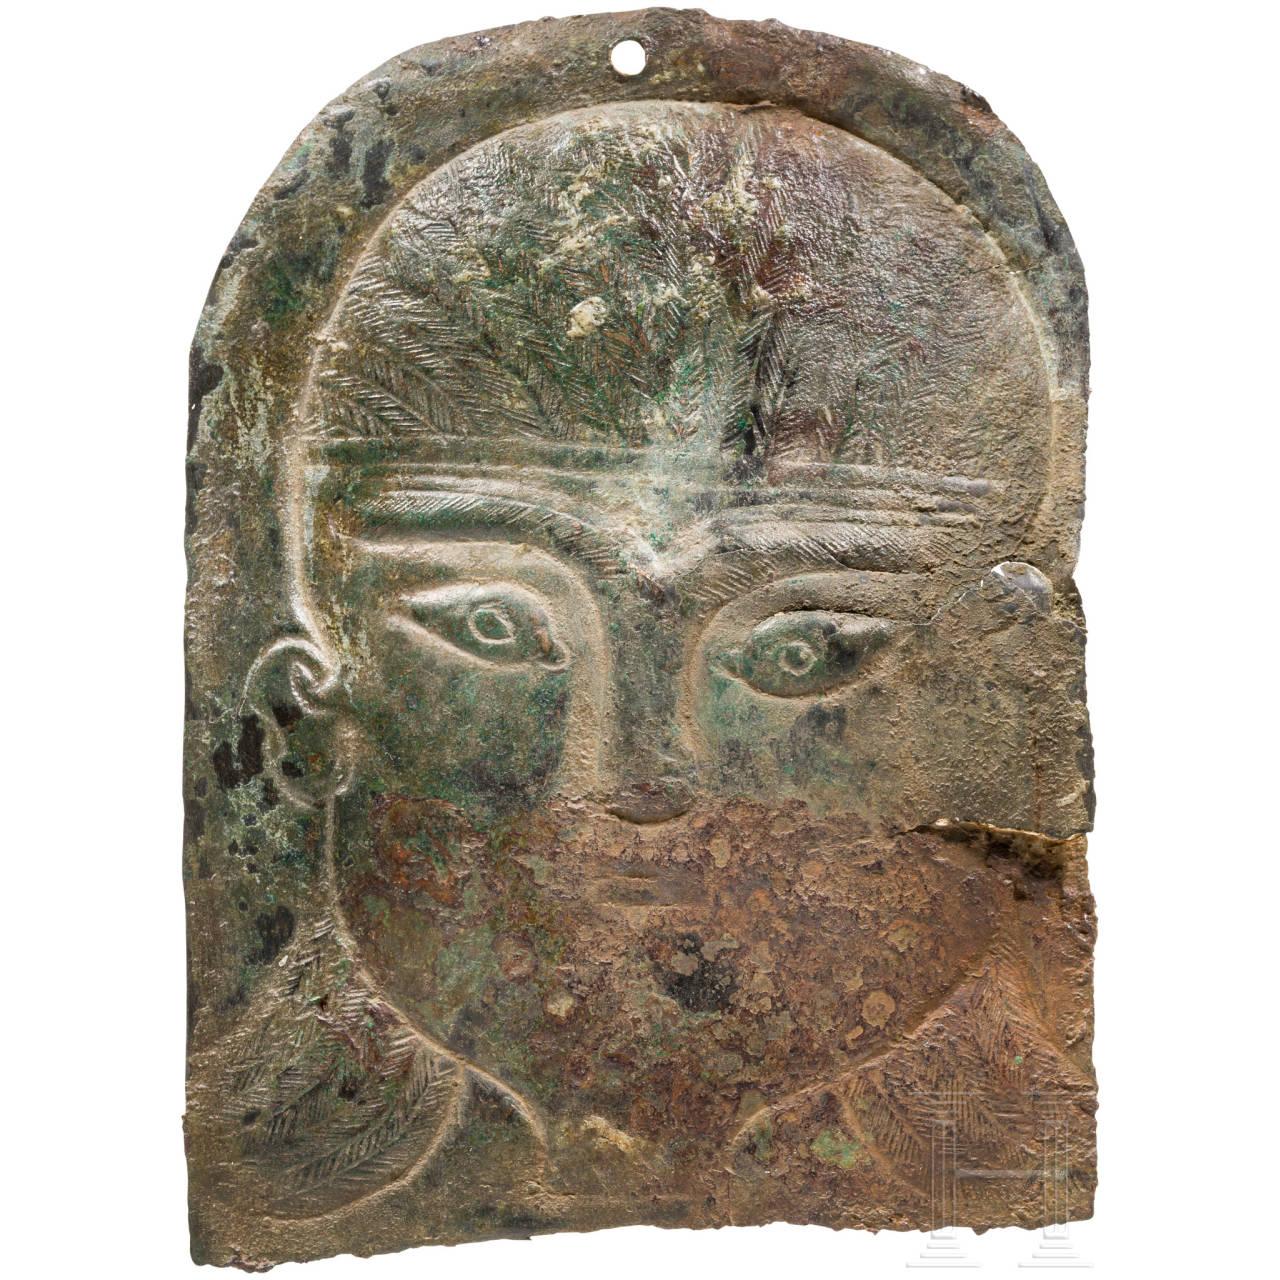 Fein ziseliertes Votivblech mit Kopf, urartäisch, 8. Jhdt. v. Chr.